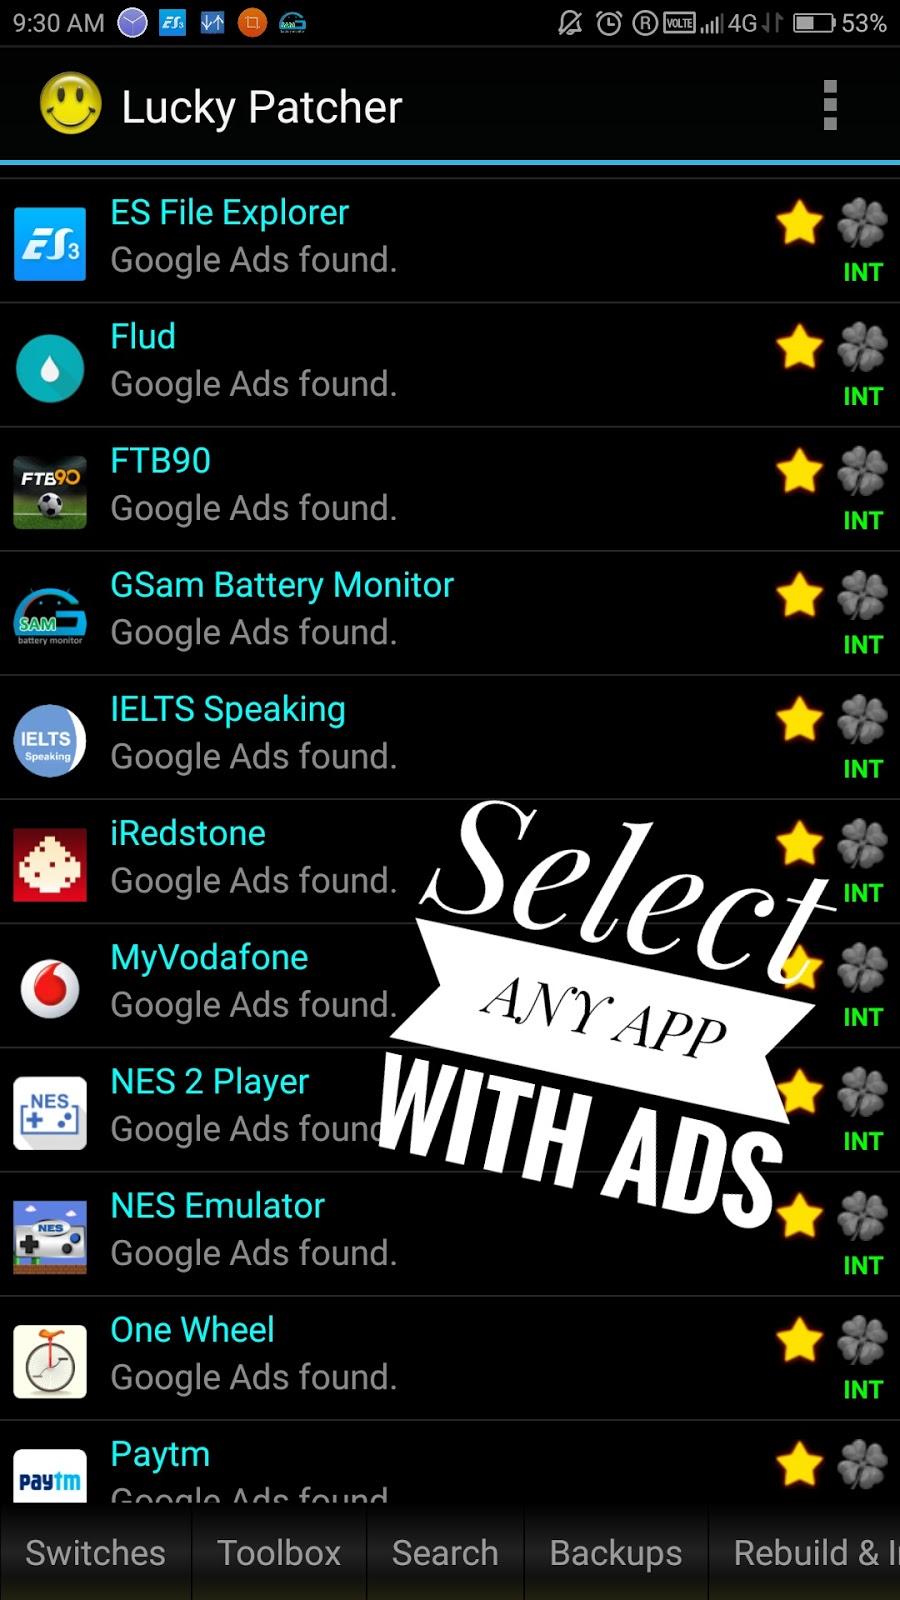 lucky patcher app  from google